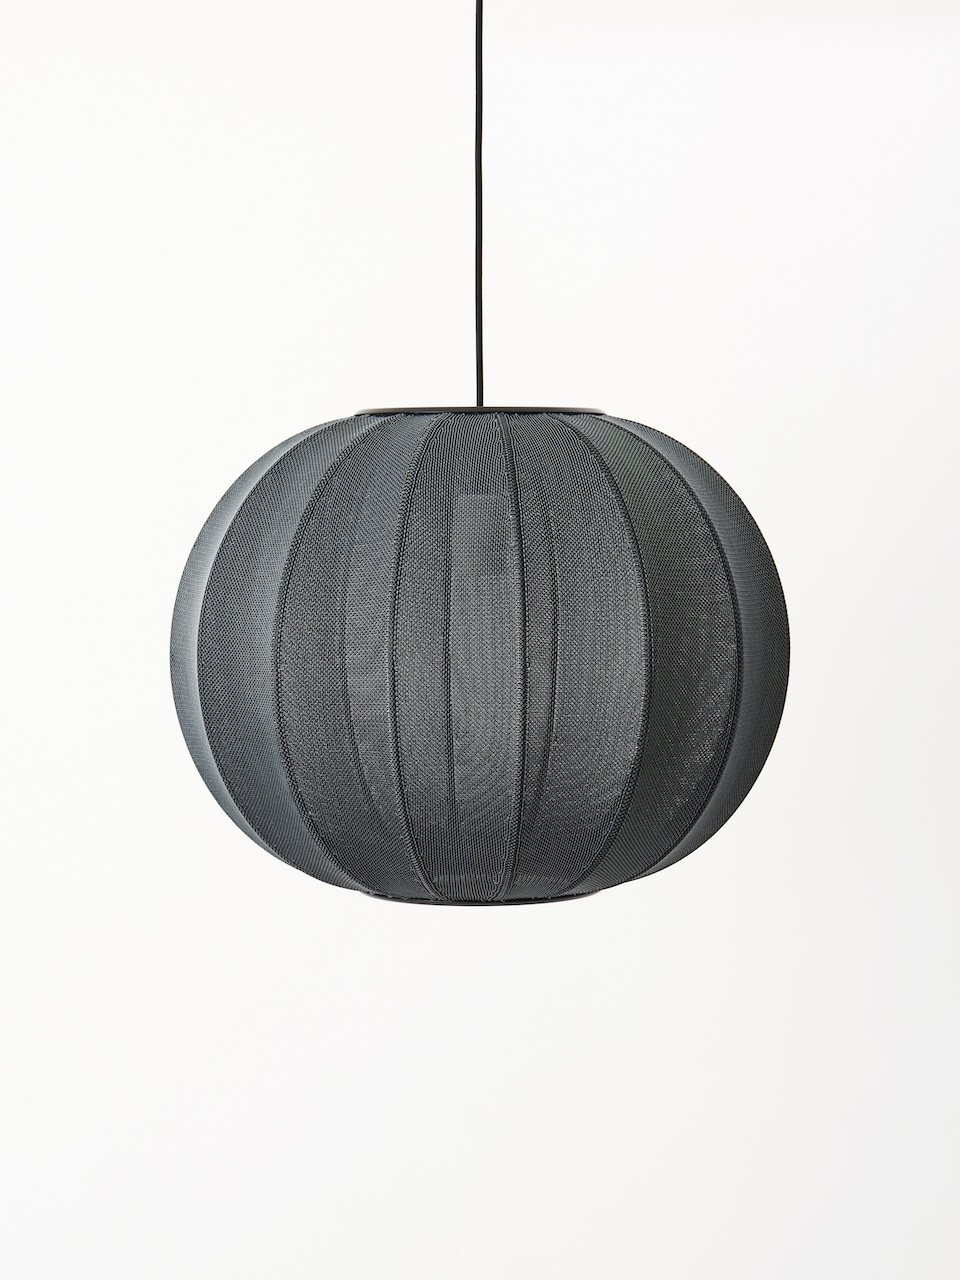 Made by Hand Knit Wit Pendelleuchte black ø45cm